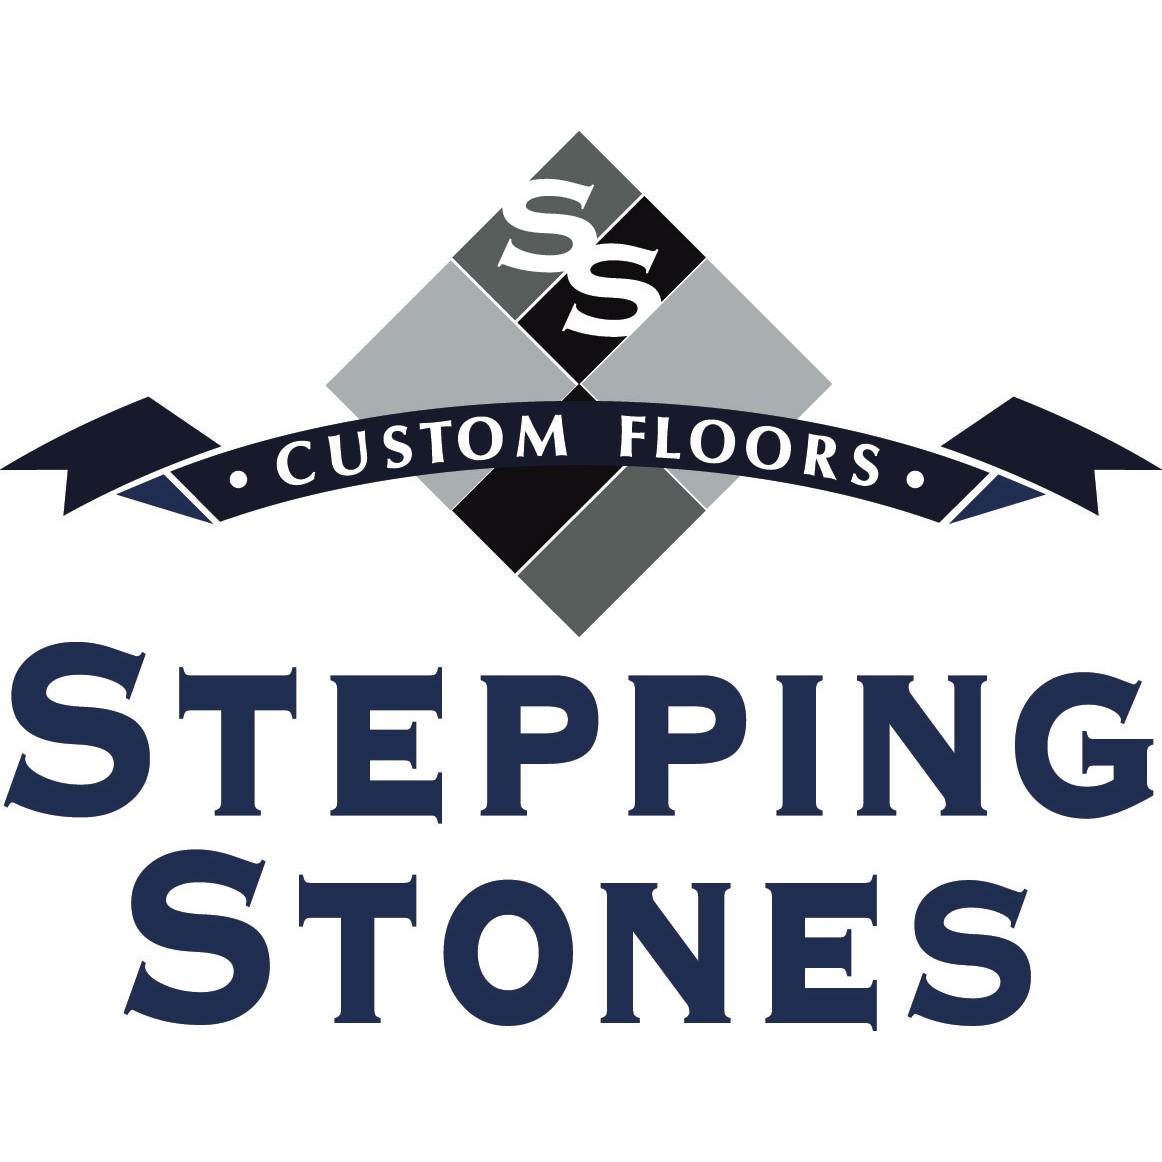 Stepping Stones - Cedar Rapids, IA - Carpet & Floor Coverings